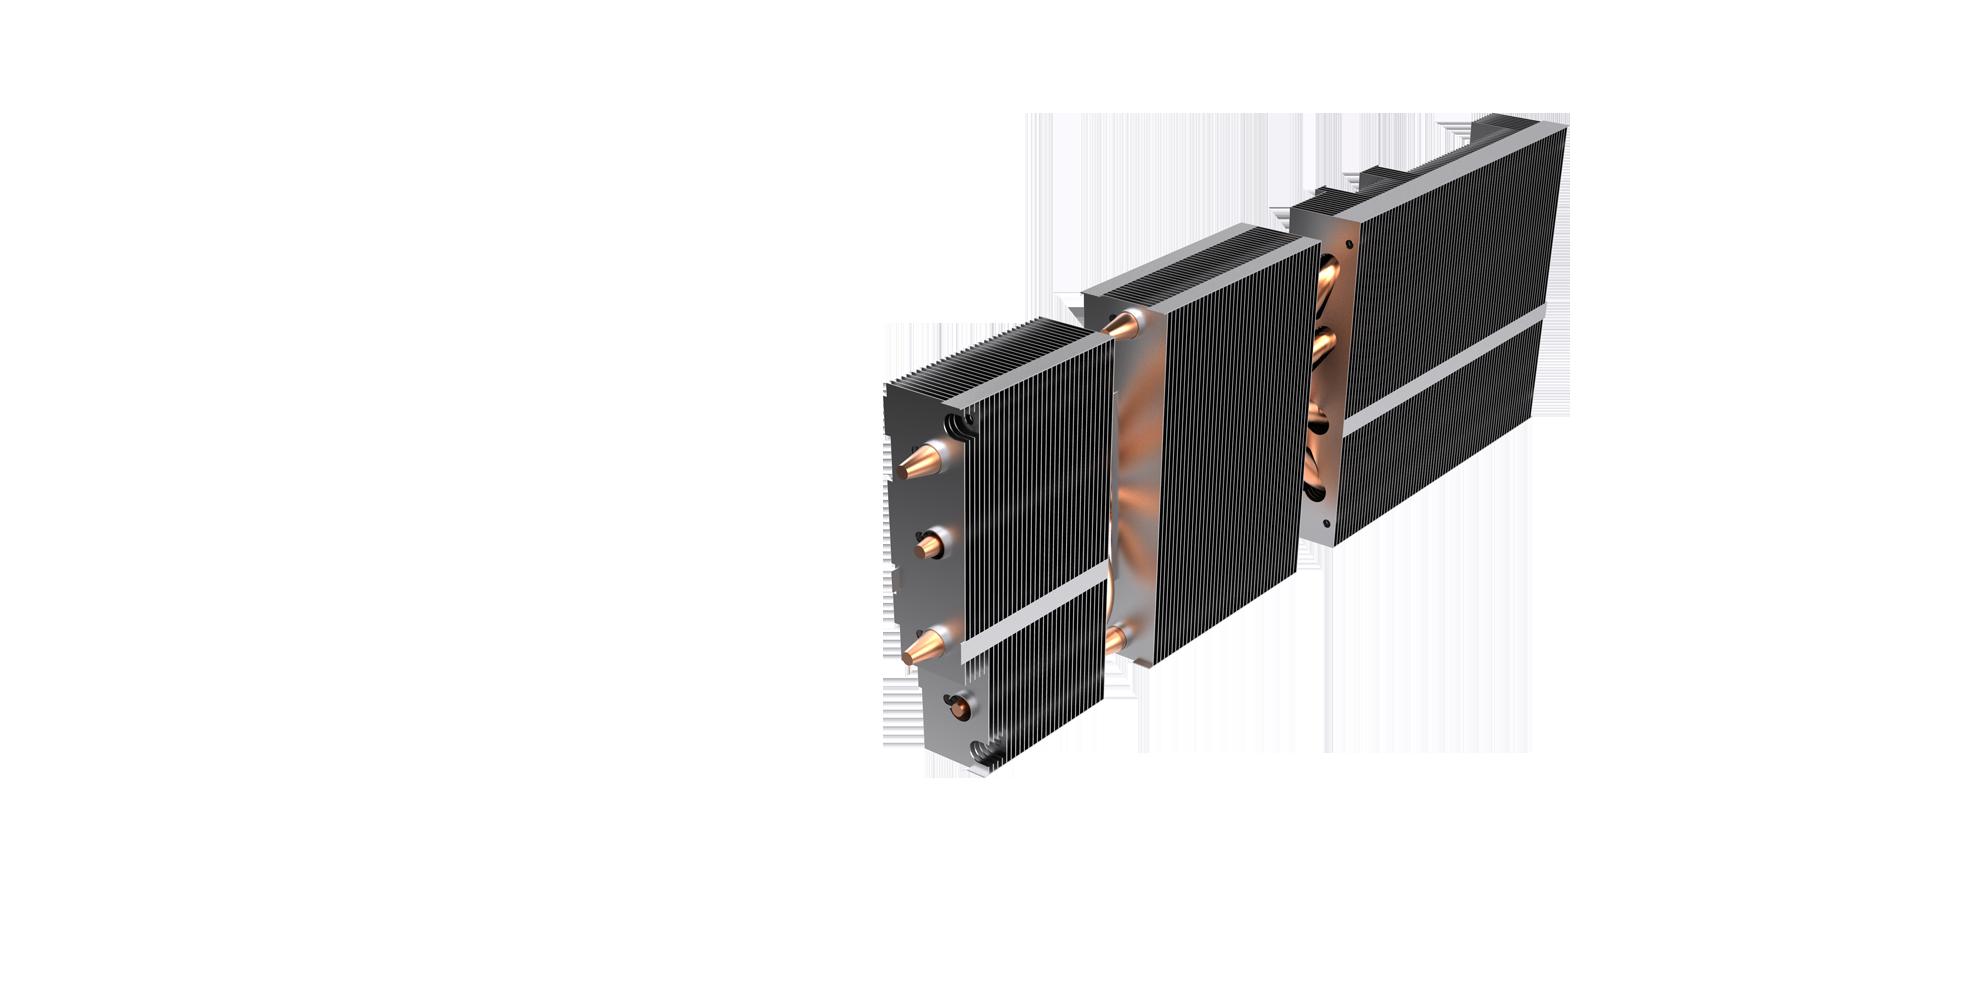 GIGABYTE RTX 2080 Ti OC 11GB DDR6 Triple-Fan